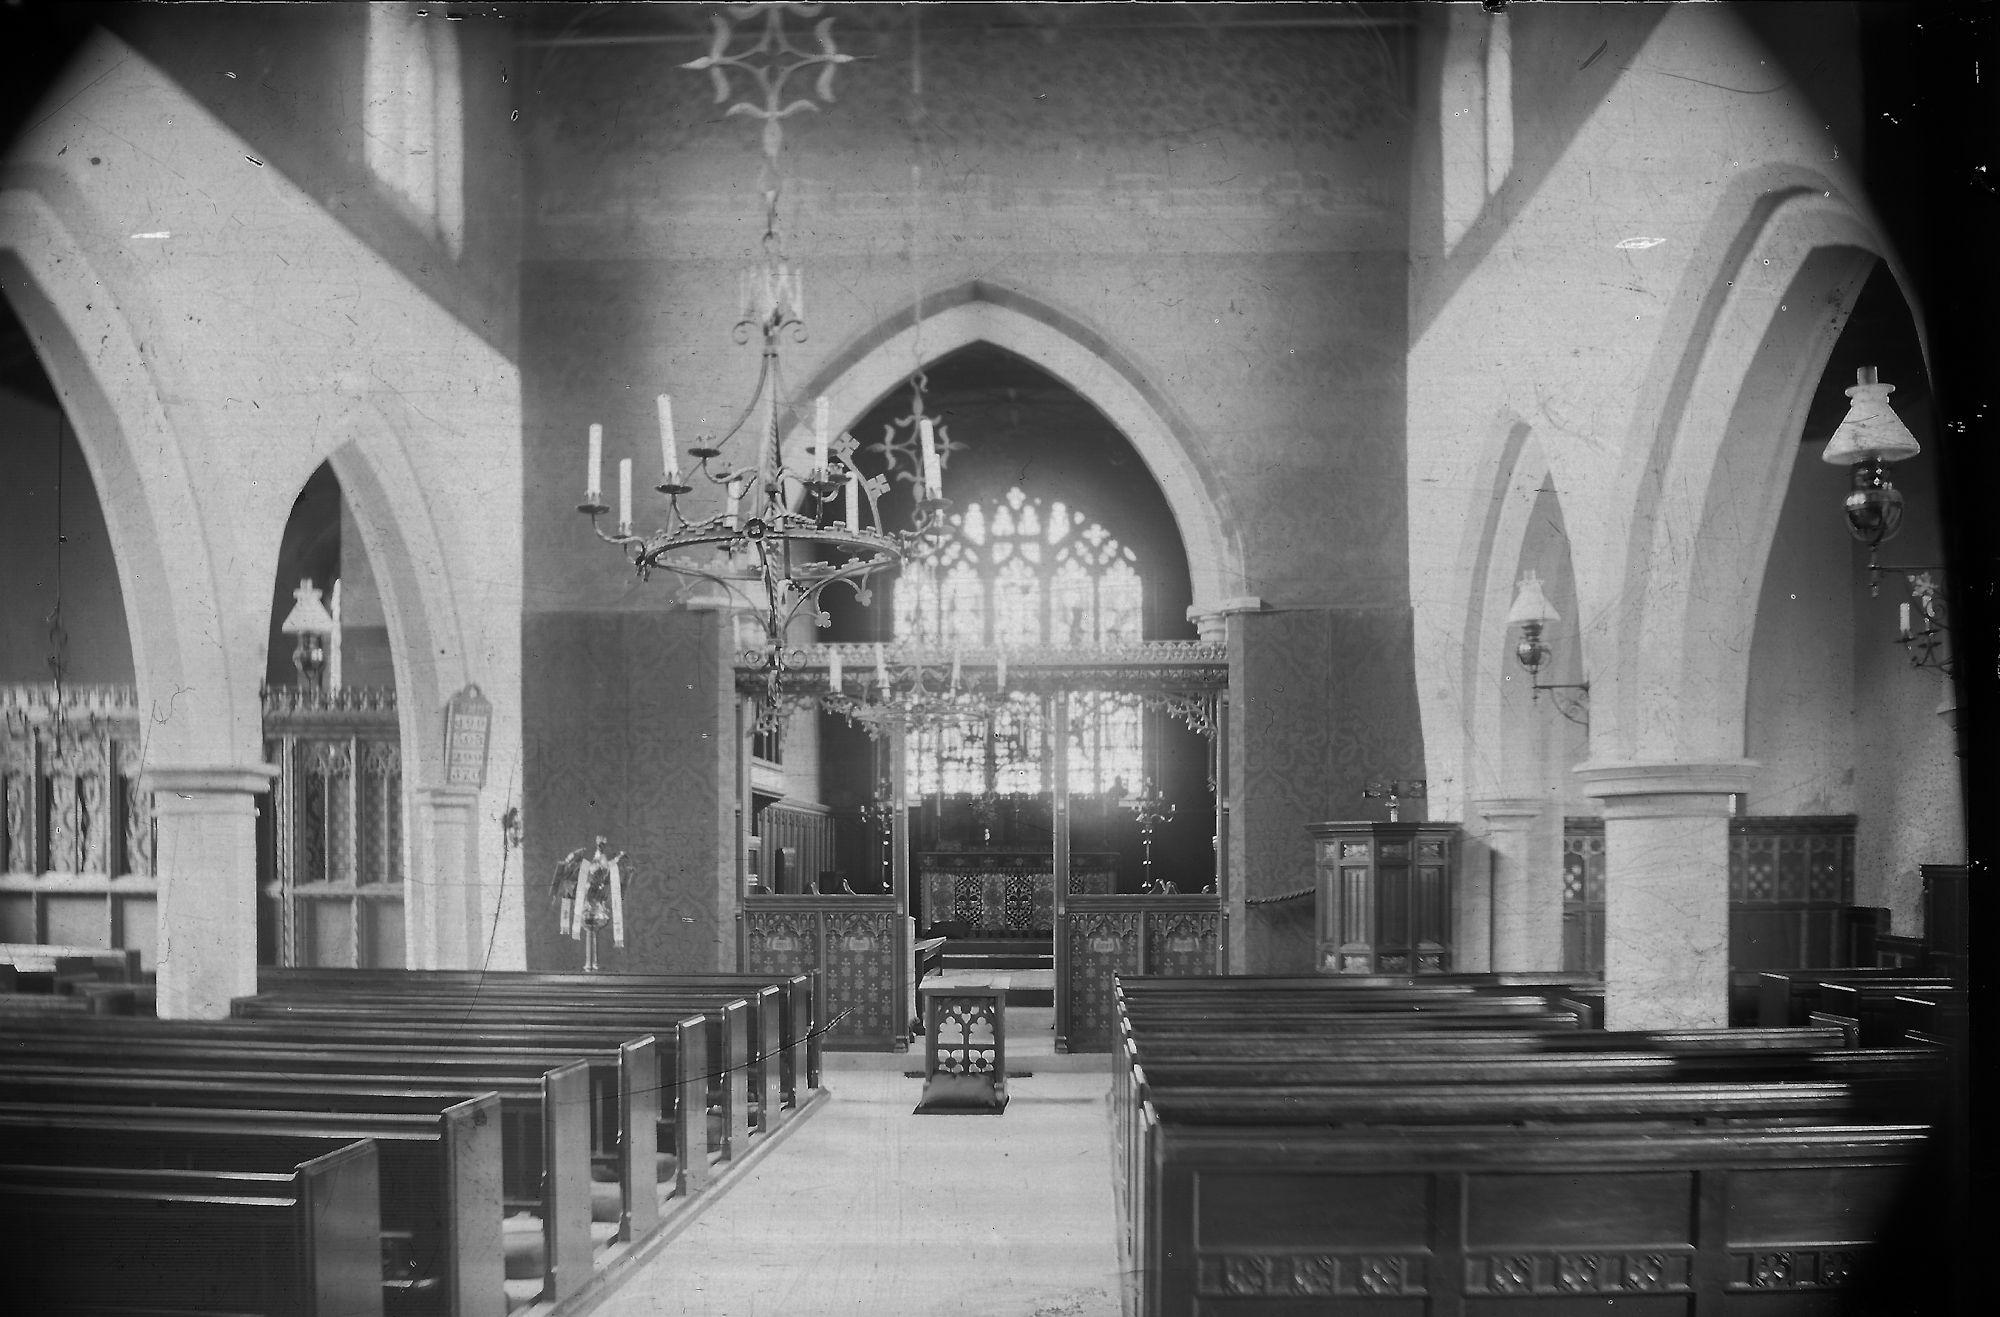 interior of st mary's plumtree c1900